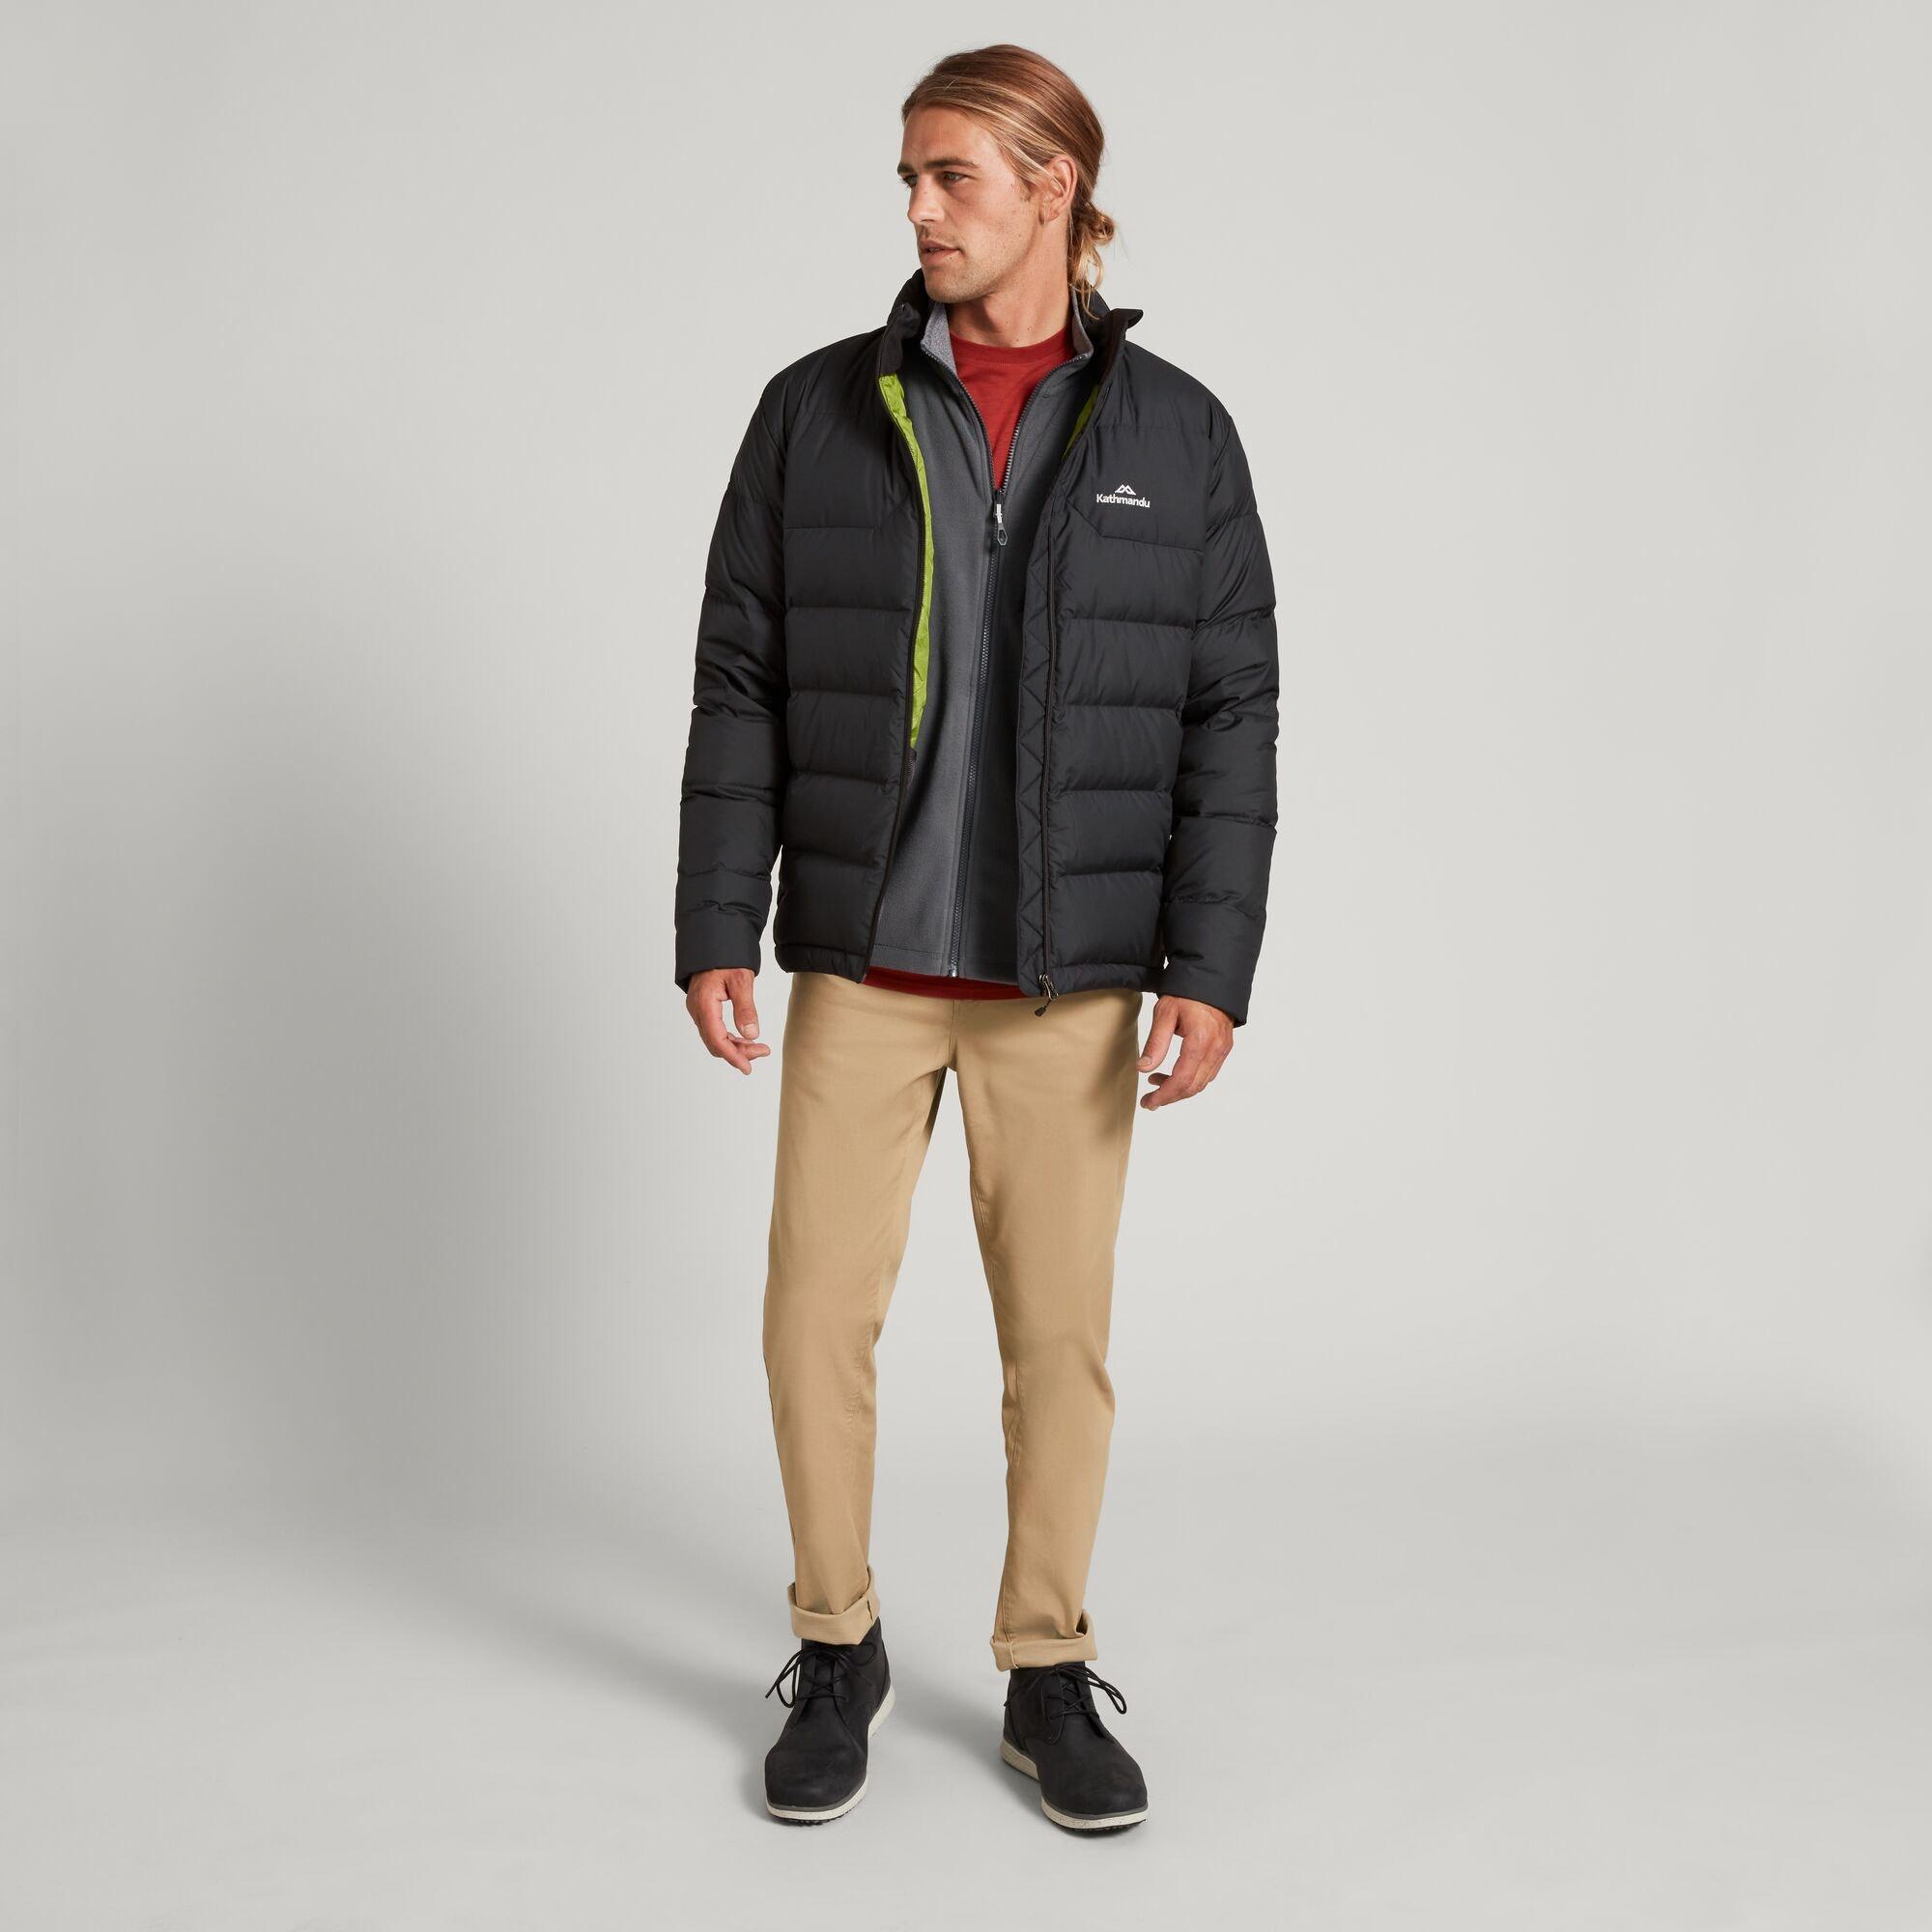 thumbnail 14 - NEW Kathmandu Epiq Mens 600 Fill Down Puffer Warm Outdoor Winter Jacket